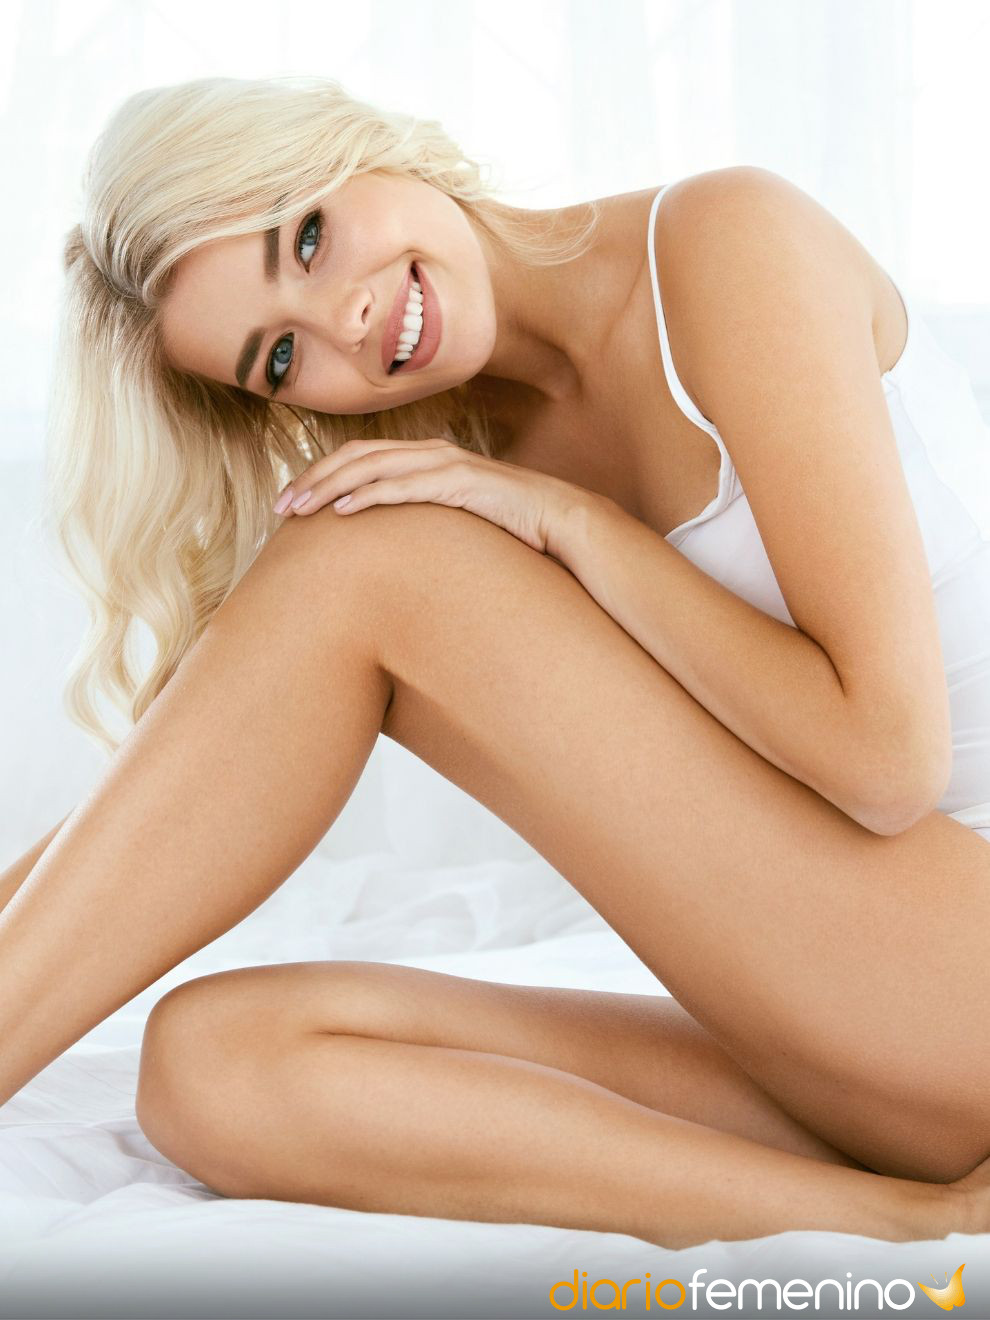 Tips de higiene íntima: ropa interior de algodón